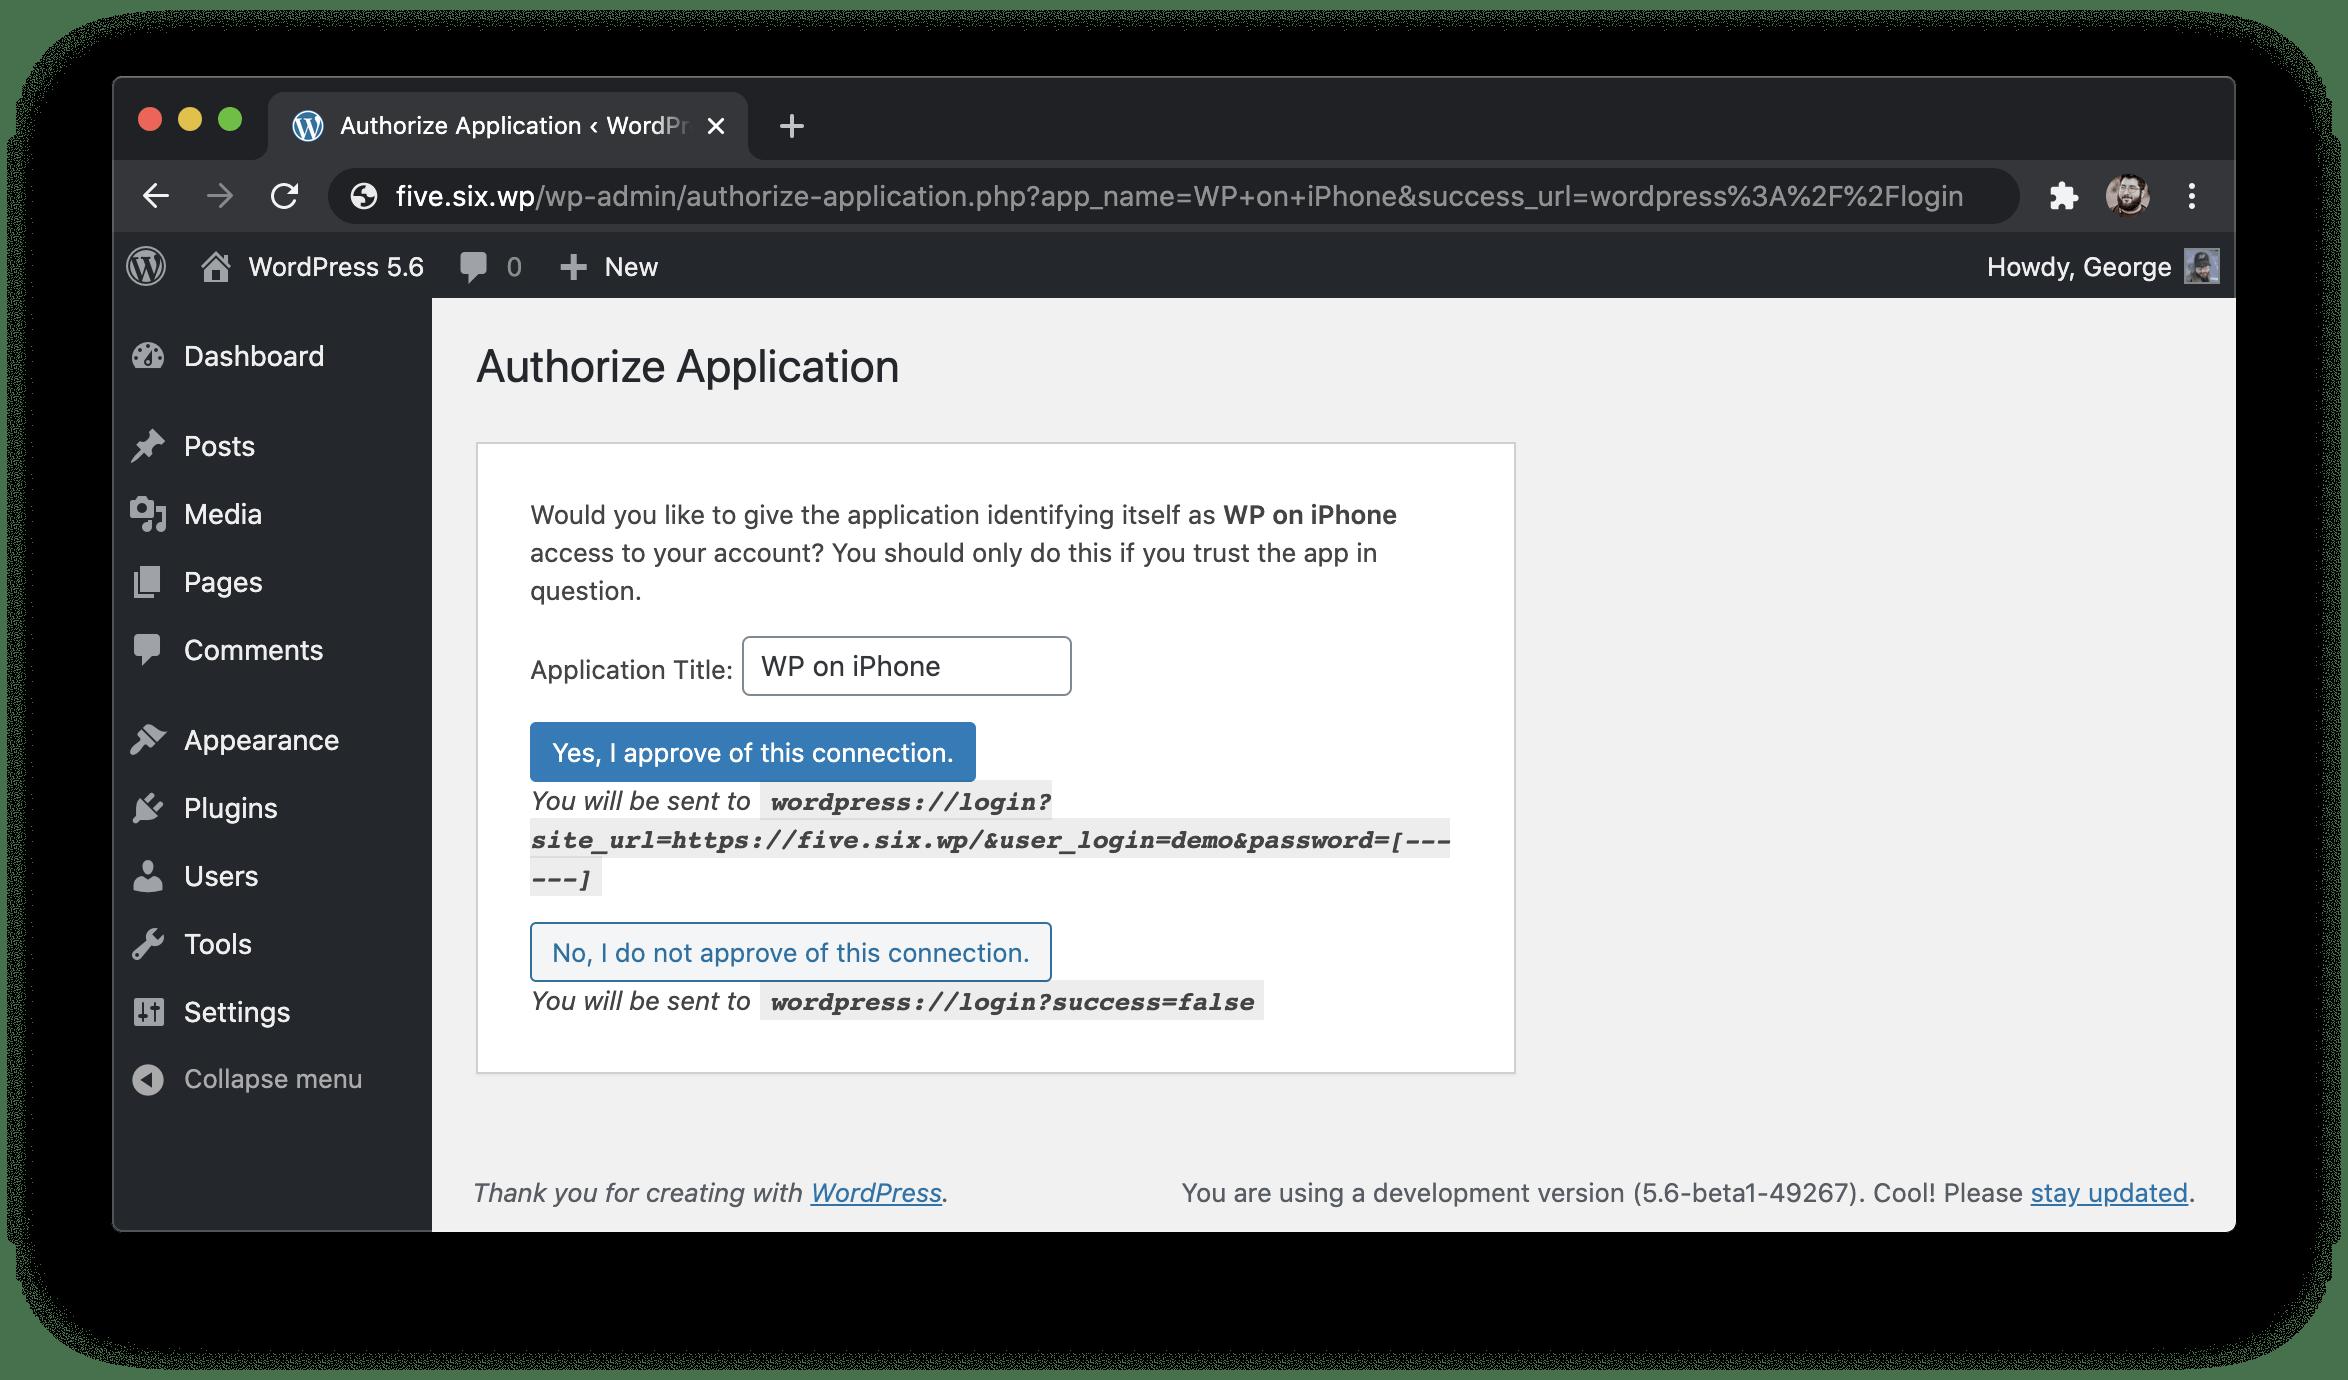 b1a0bfc33b2dc6841a9e58e4325926d0 - This Application Is Not Authenticated